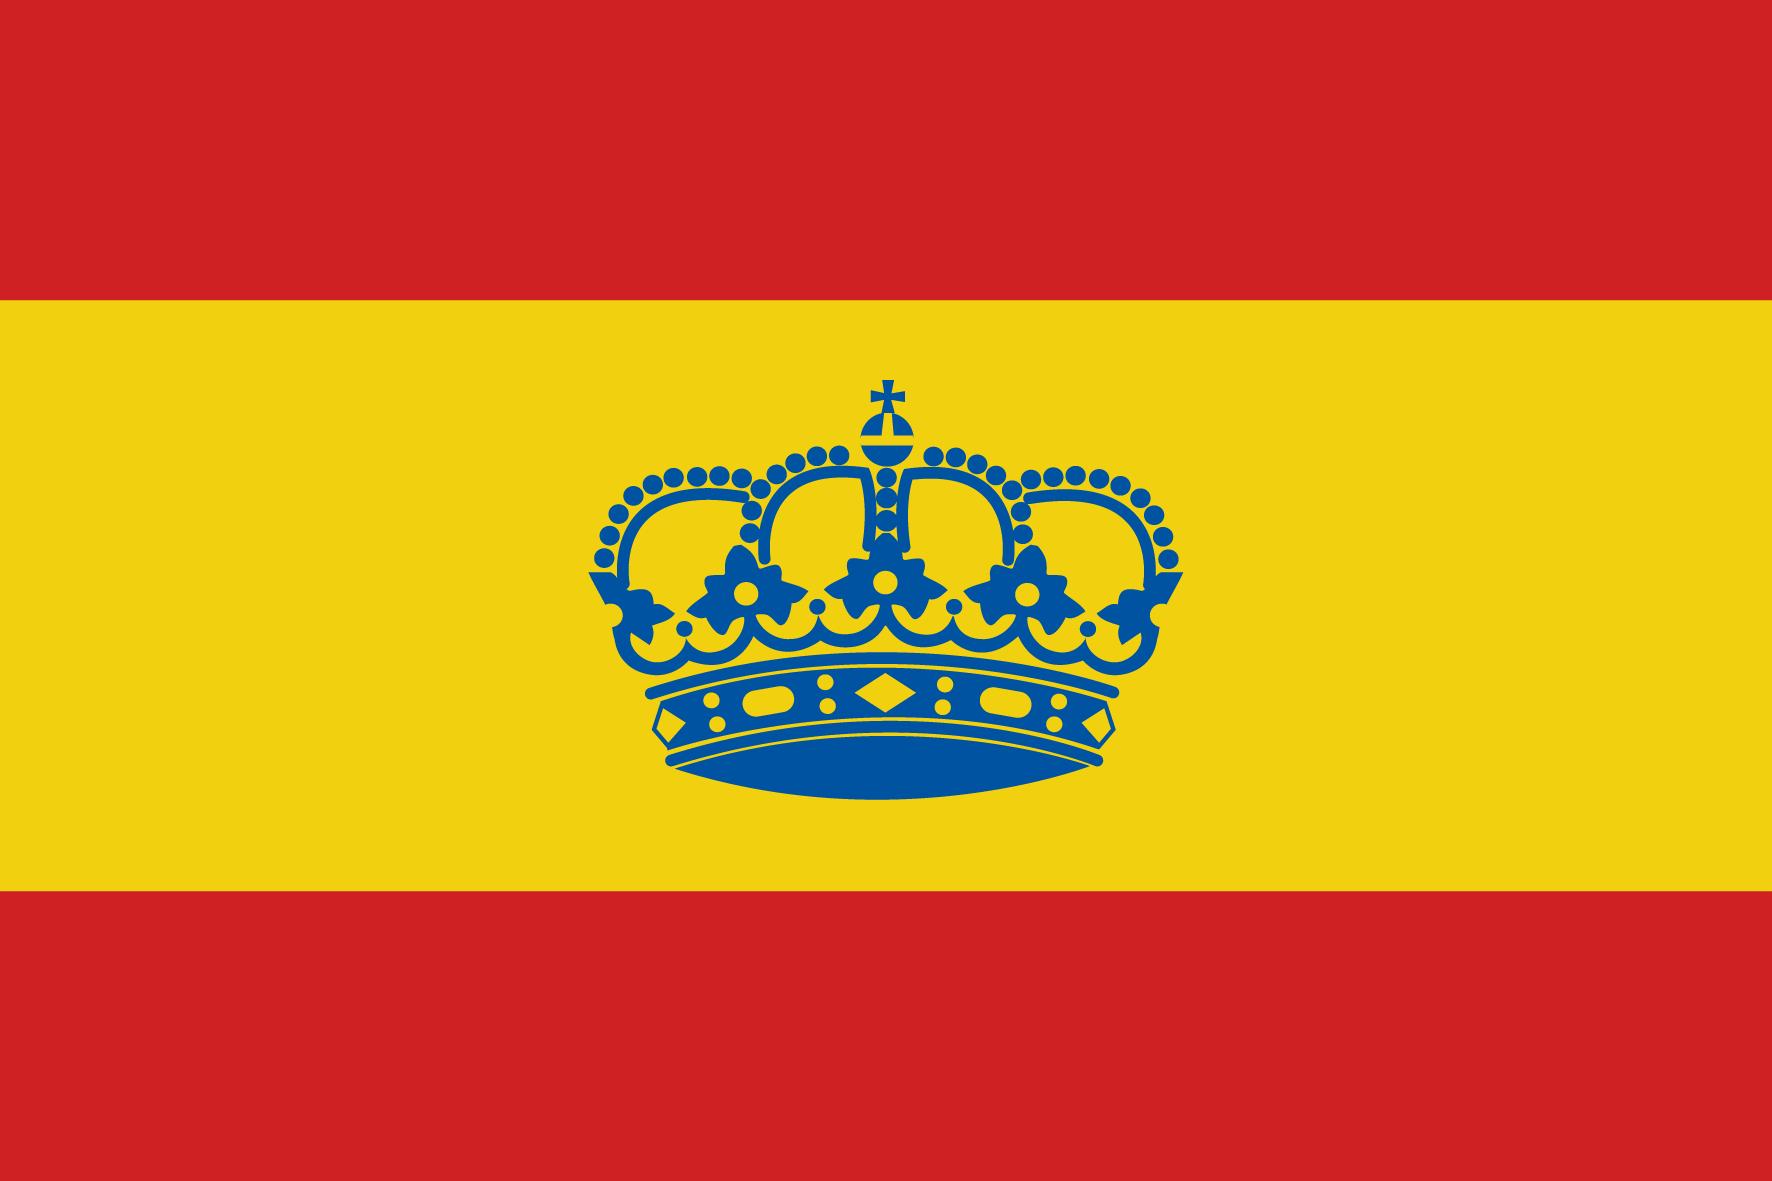 Bandera yate.png